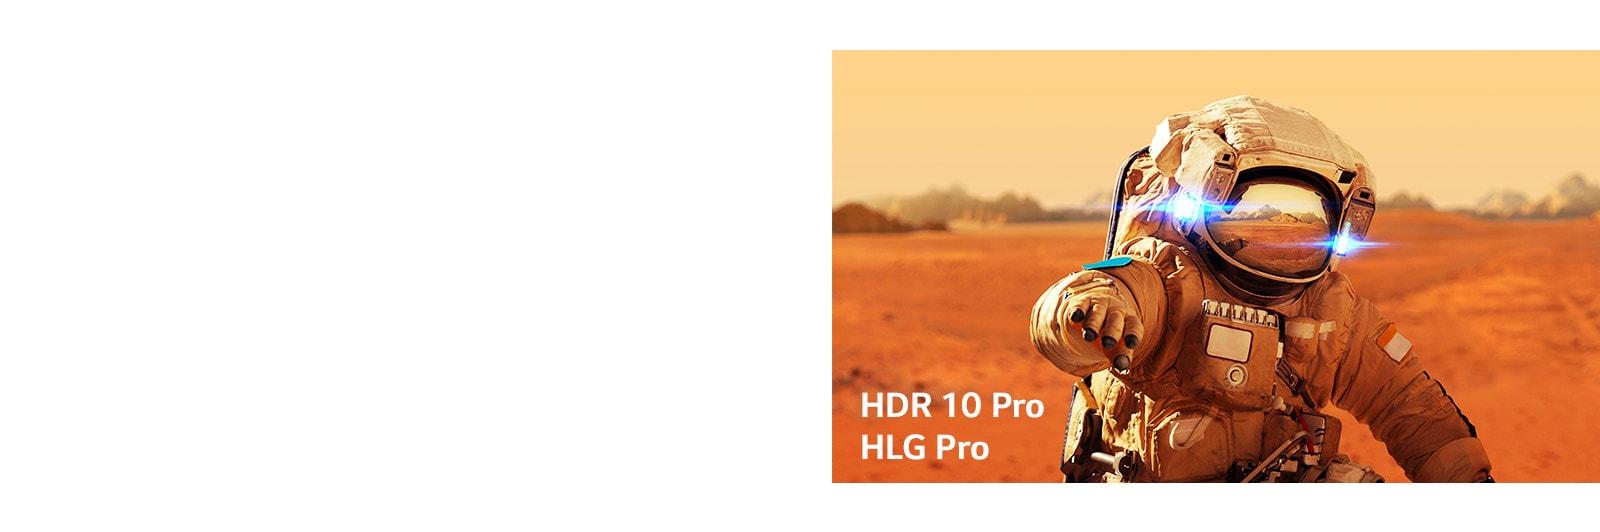 Principali formati HDR Upgraded